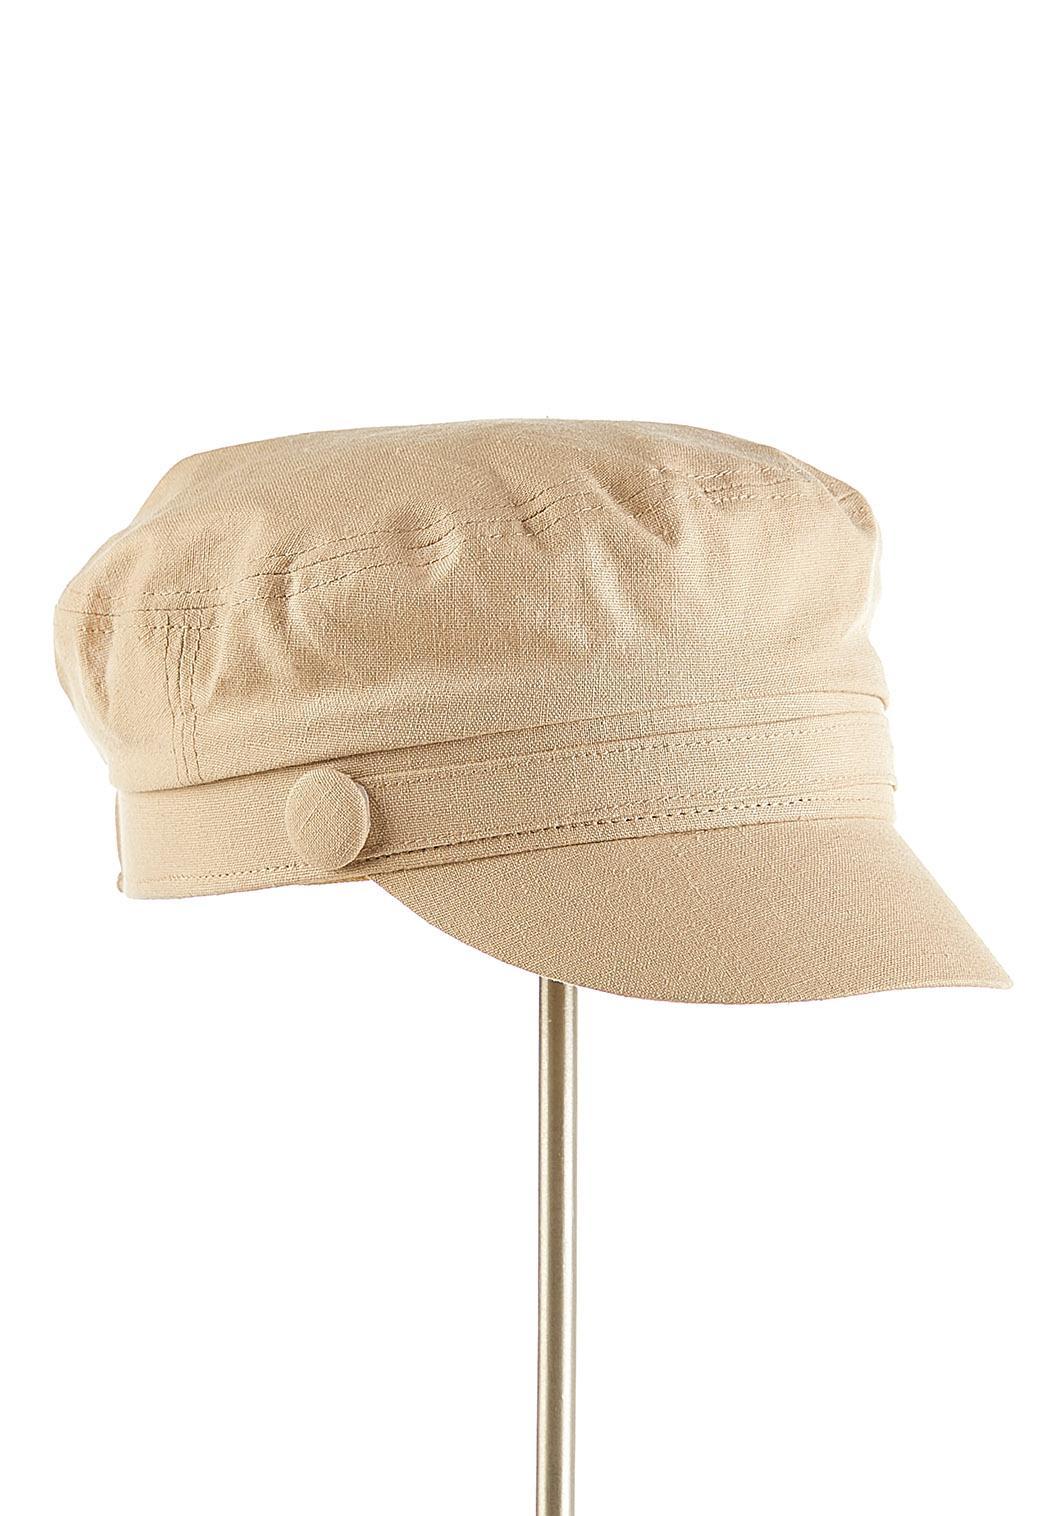 Solid Linen Cabbie Hat